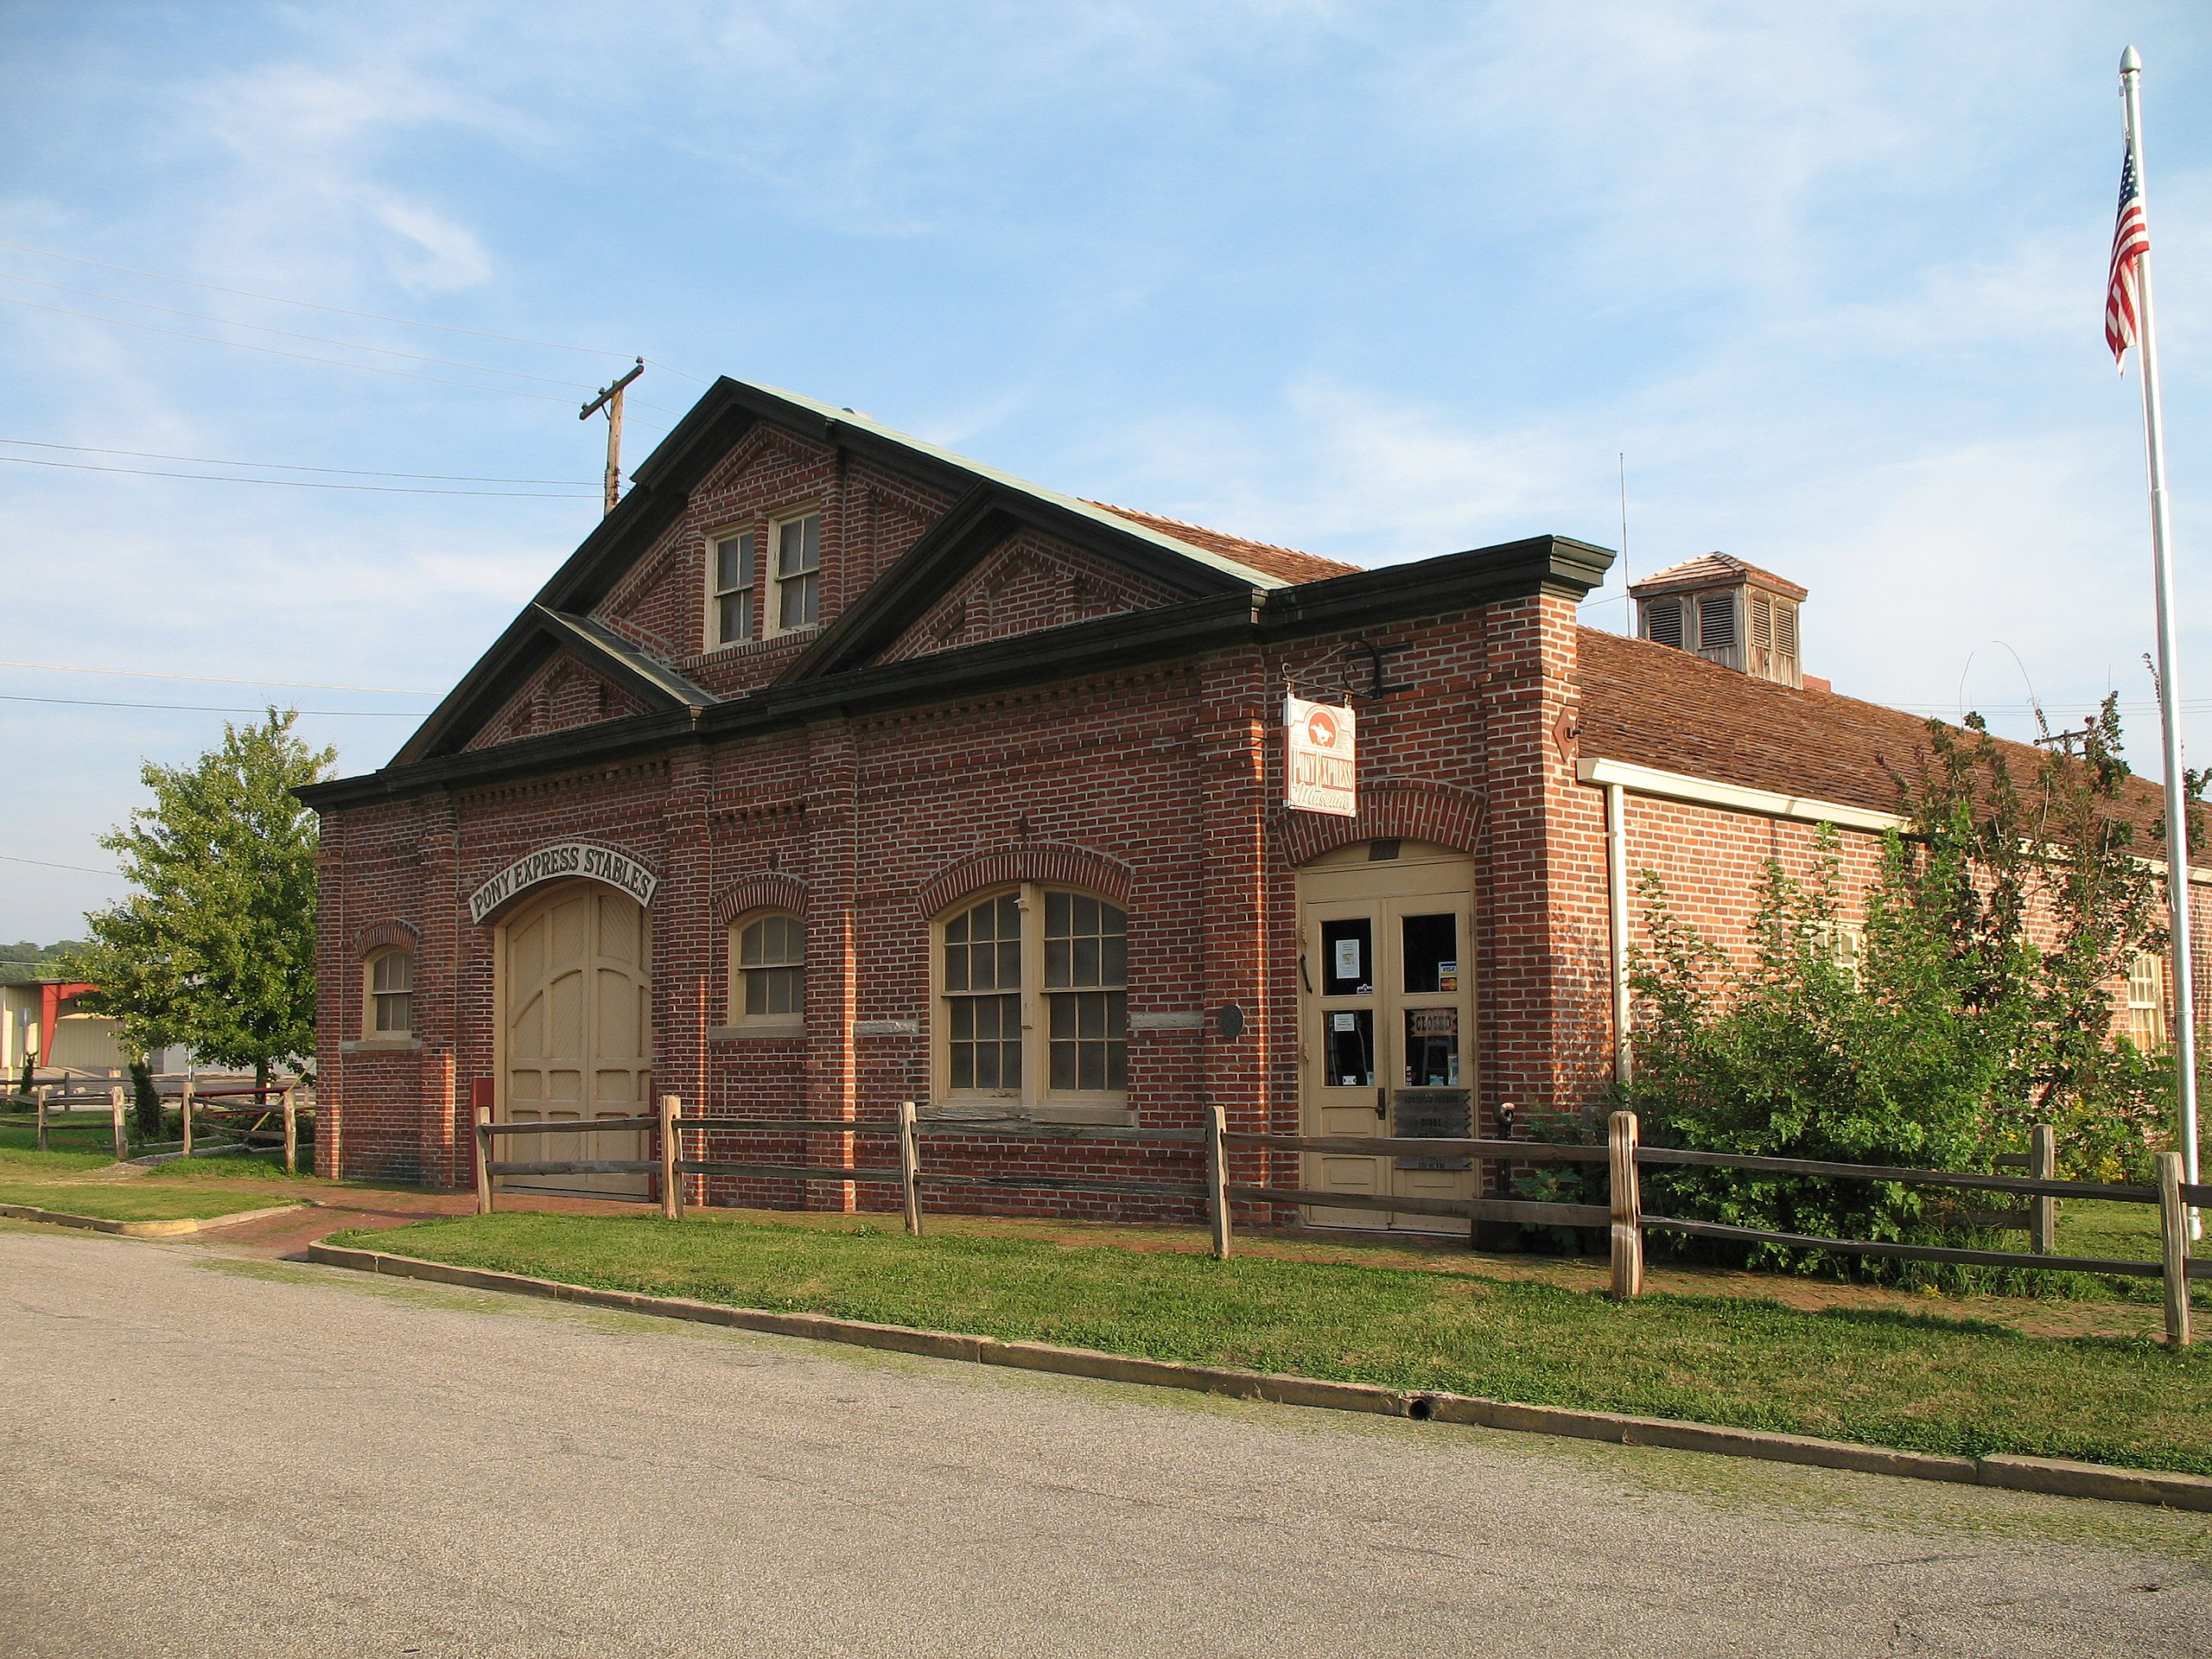 Missouri Pony Express Stables at St. Joseph Historic Landmark